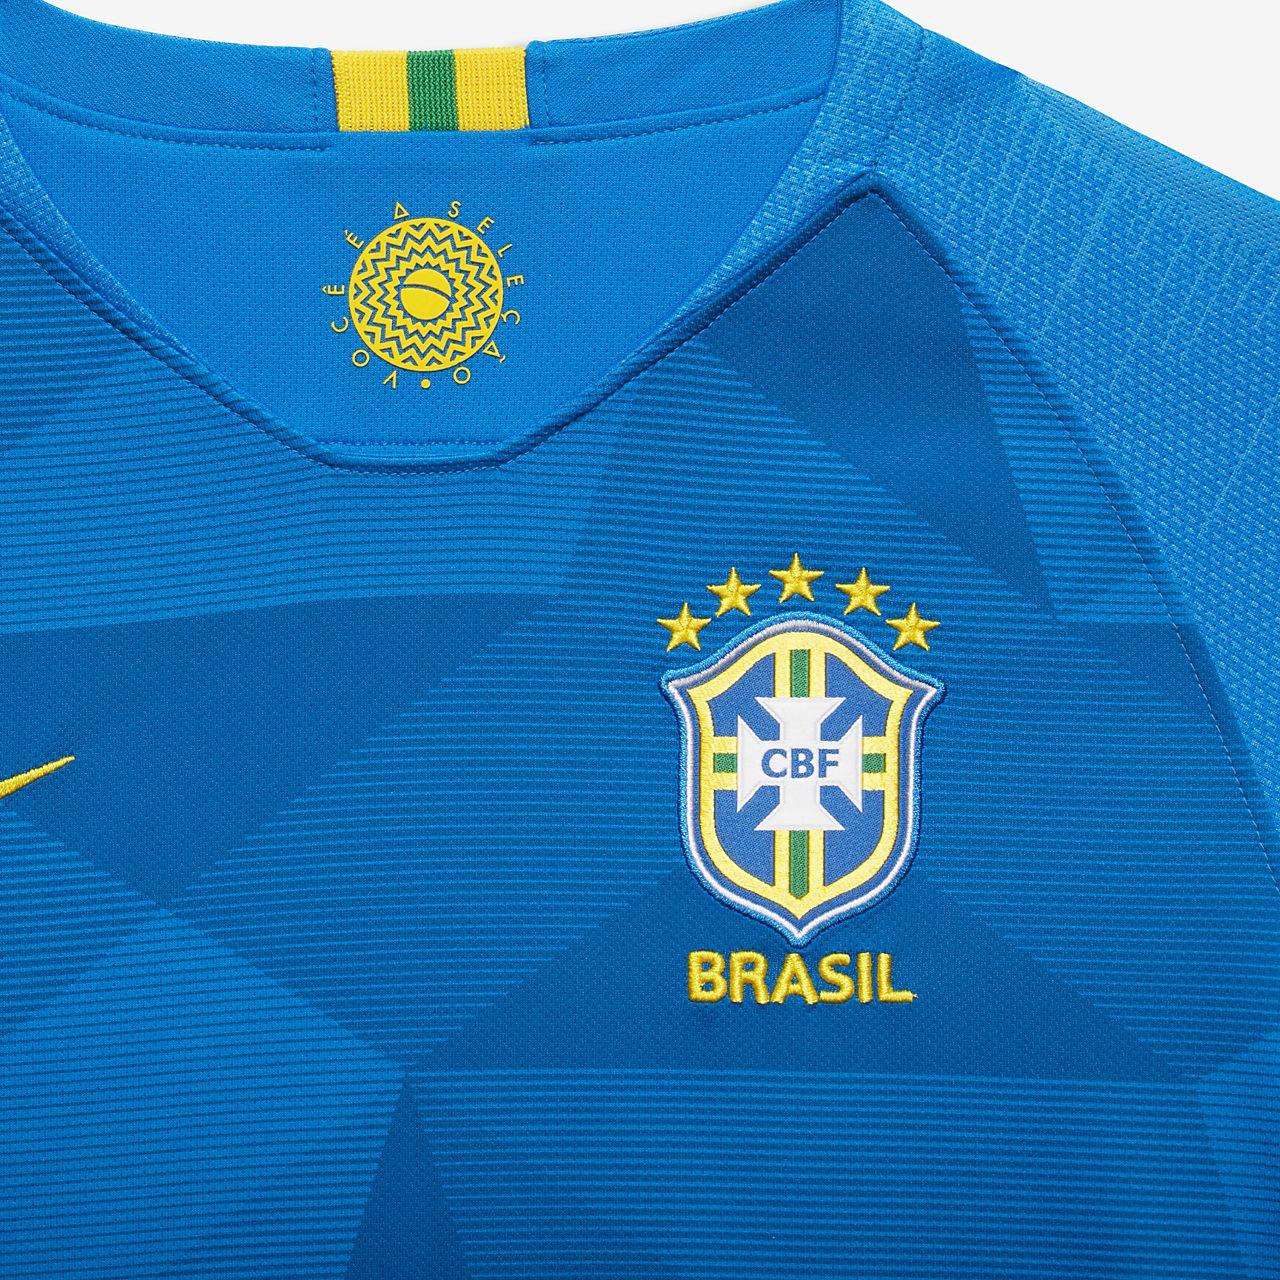 72d7333320 ... Camiseta de fútbol para niños talla grande 2018 Brasil CBF Stadium Away